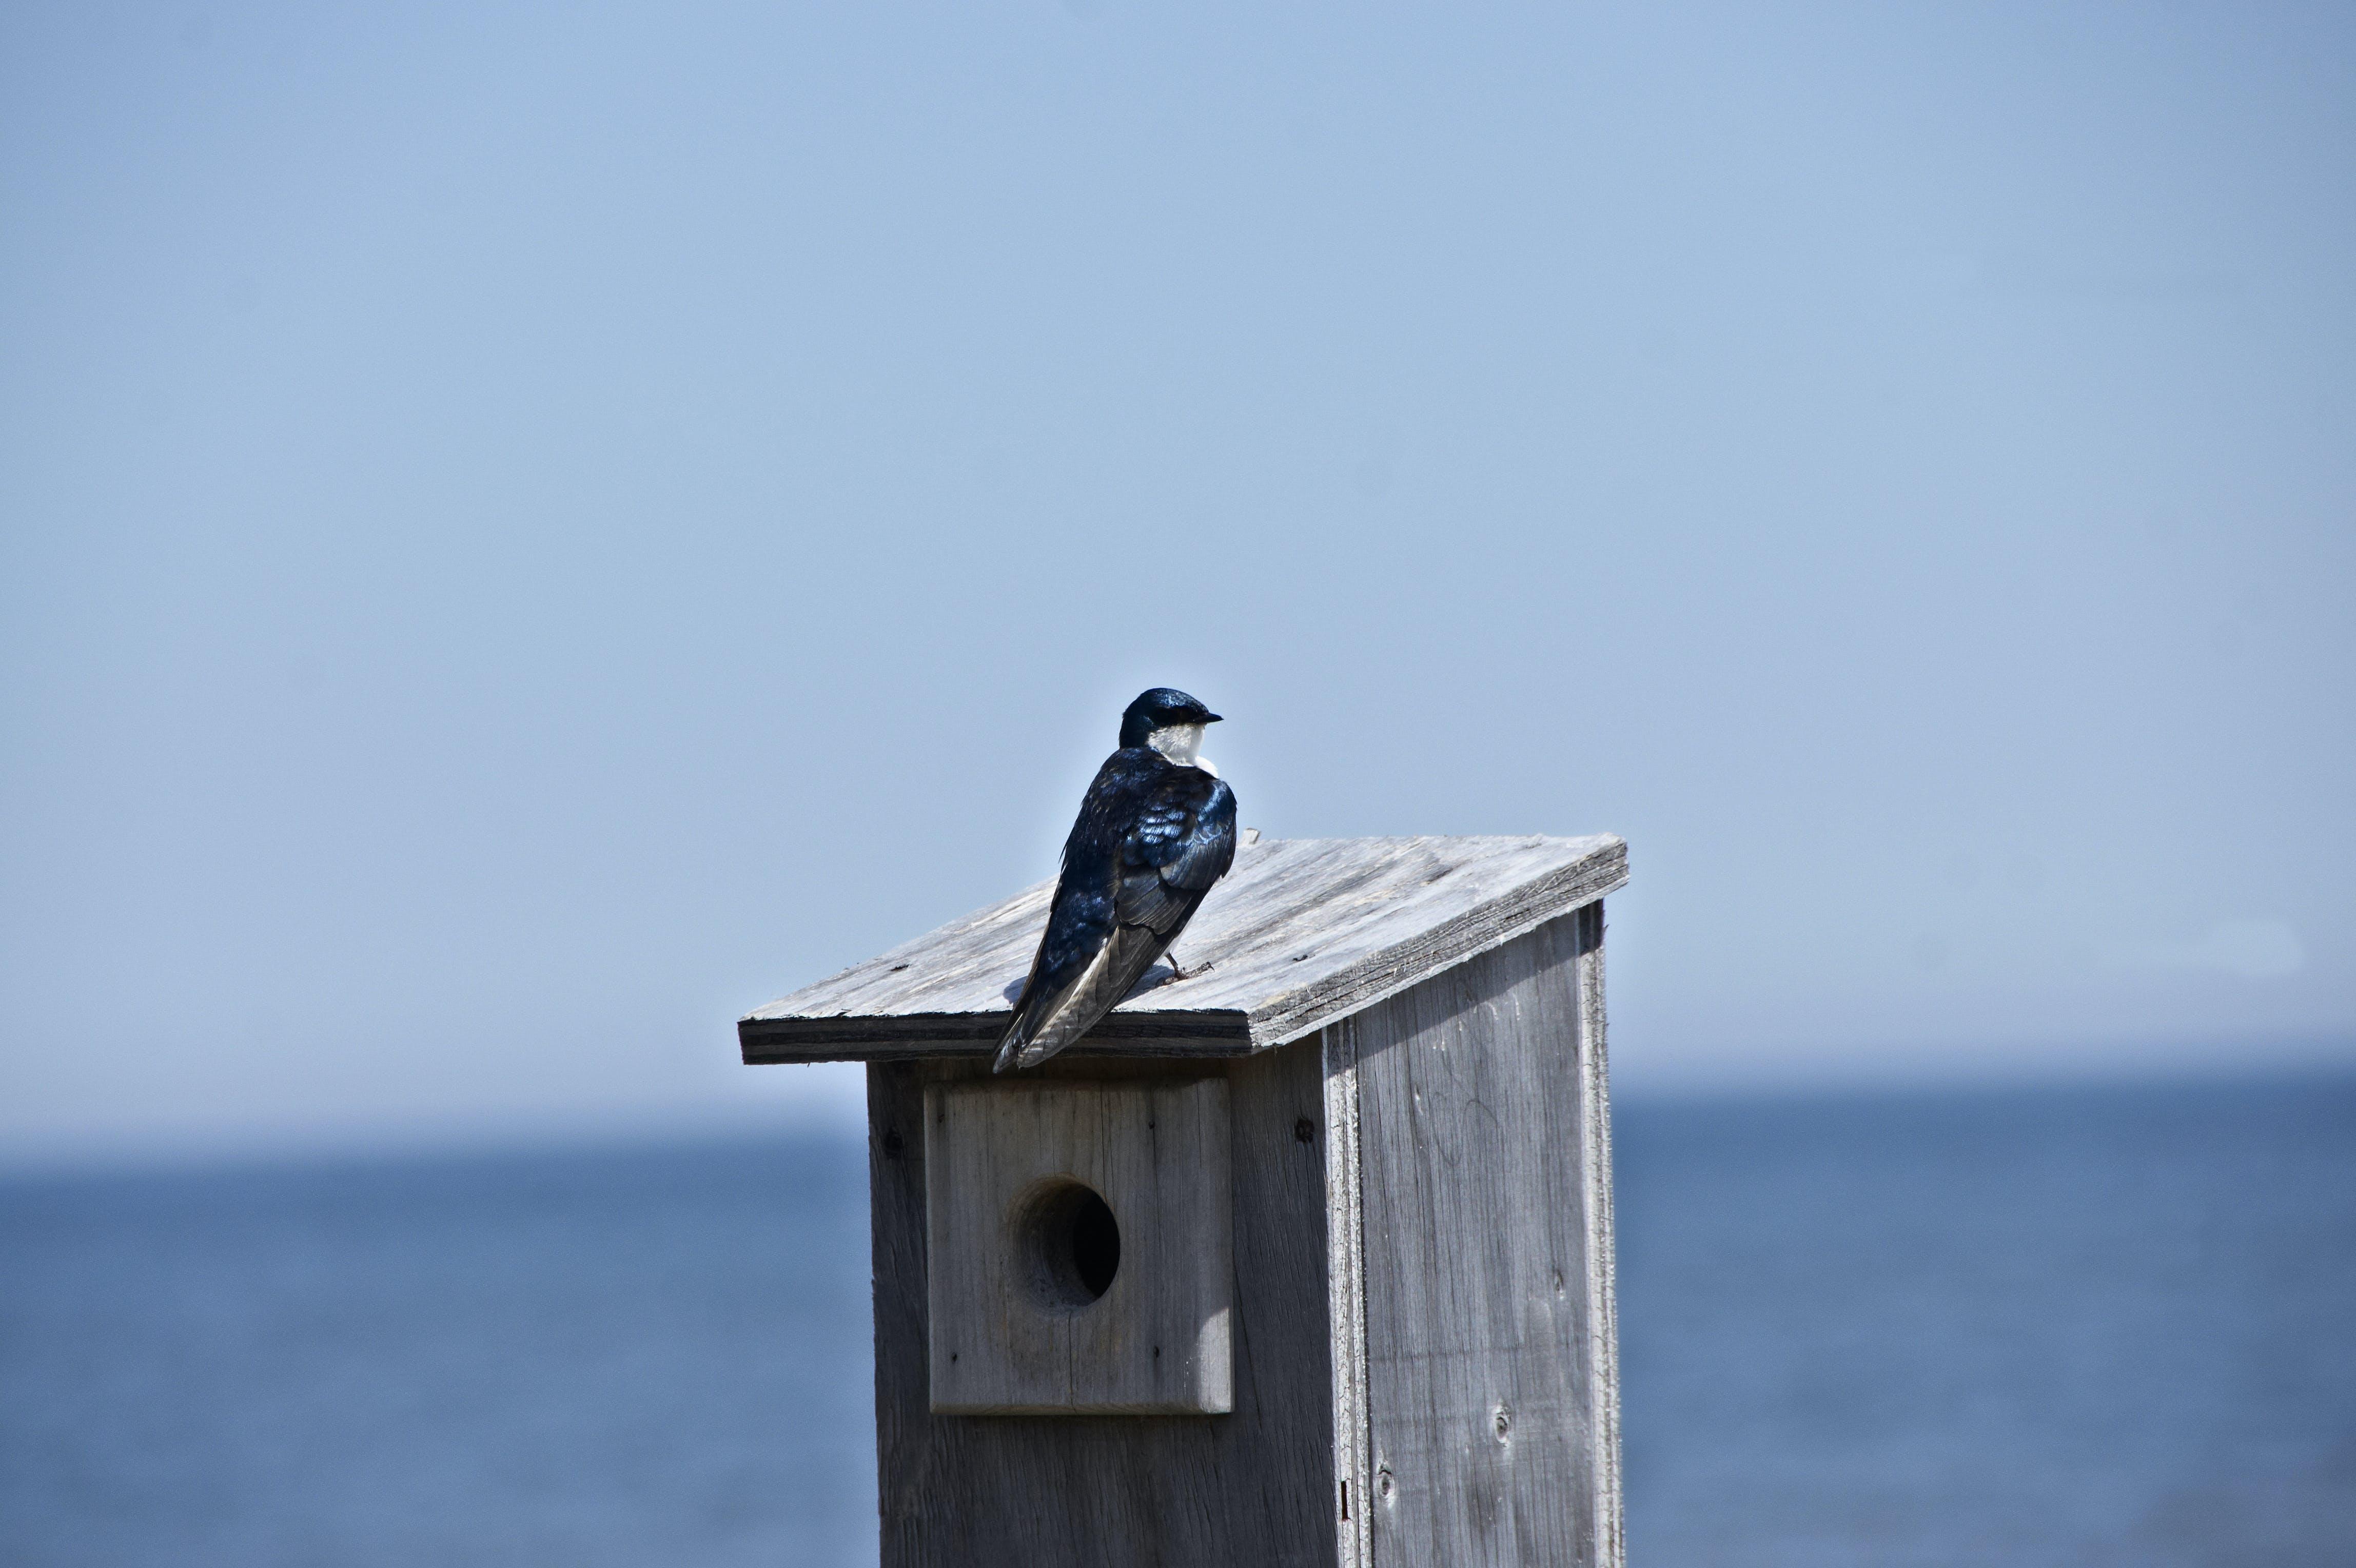 Free stock photo of bird, bird feeder, bird house, blue bird